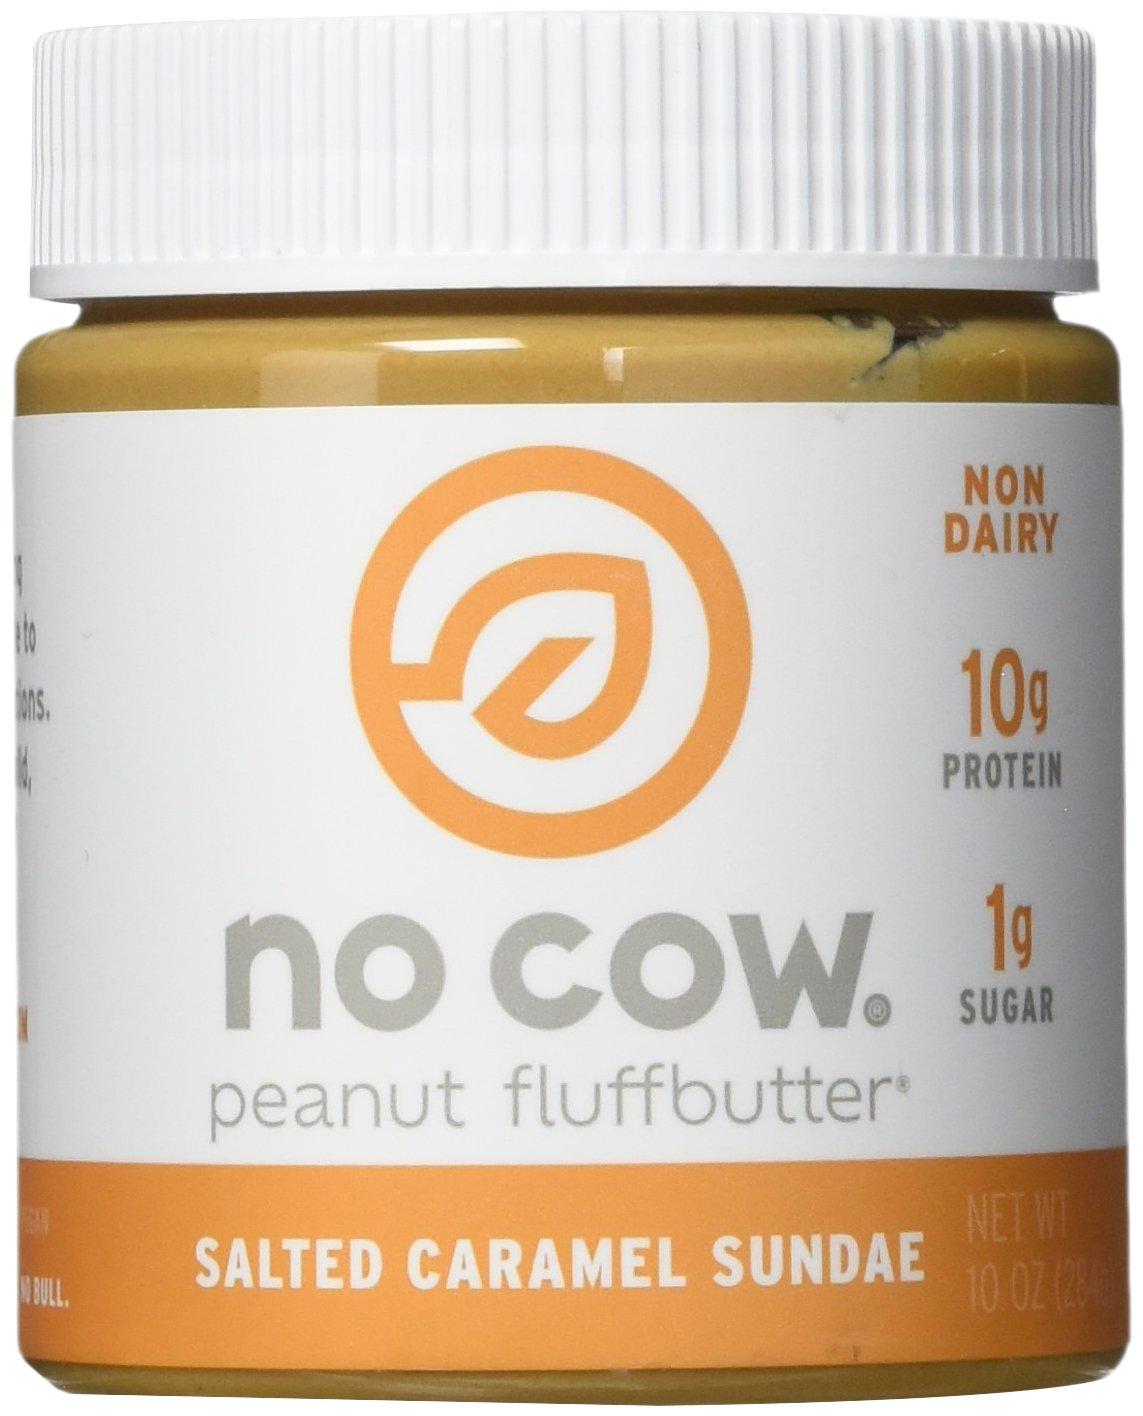 No Cow Peanut Fluffbutter, Salted Caramel, 2 Count